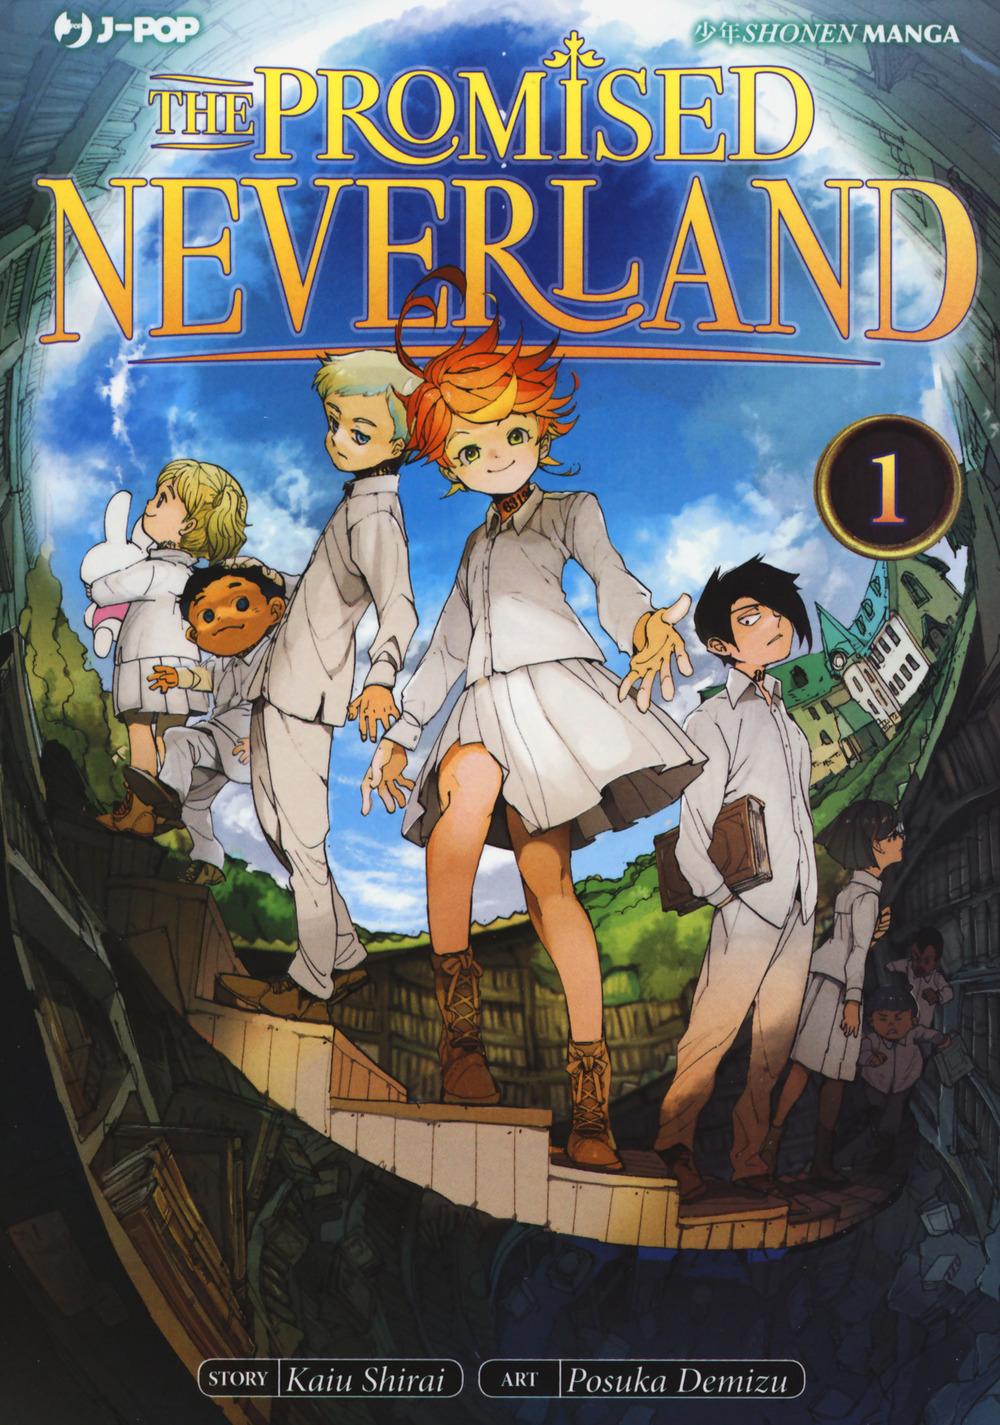 The Promised Neverland 1 - Kaiu Shirai, Posuka Demizu